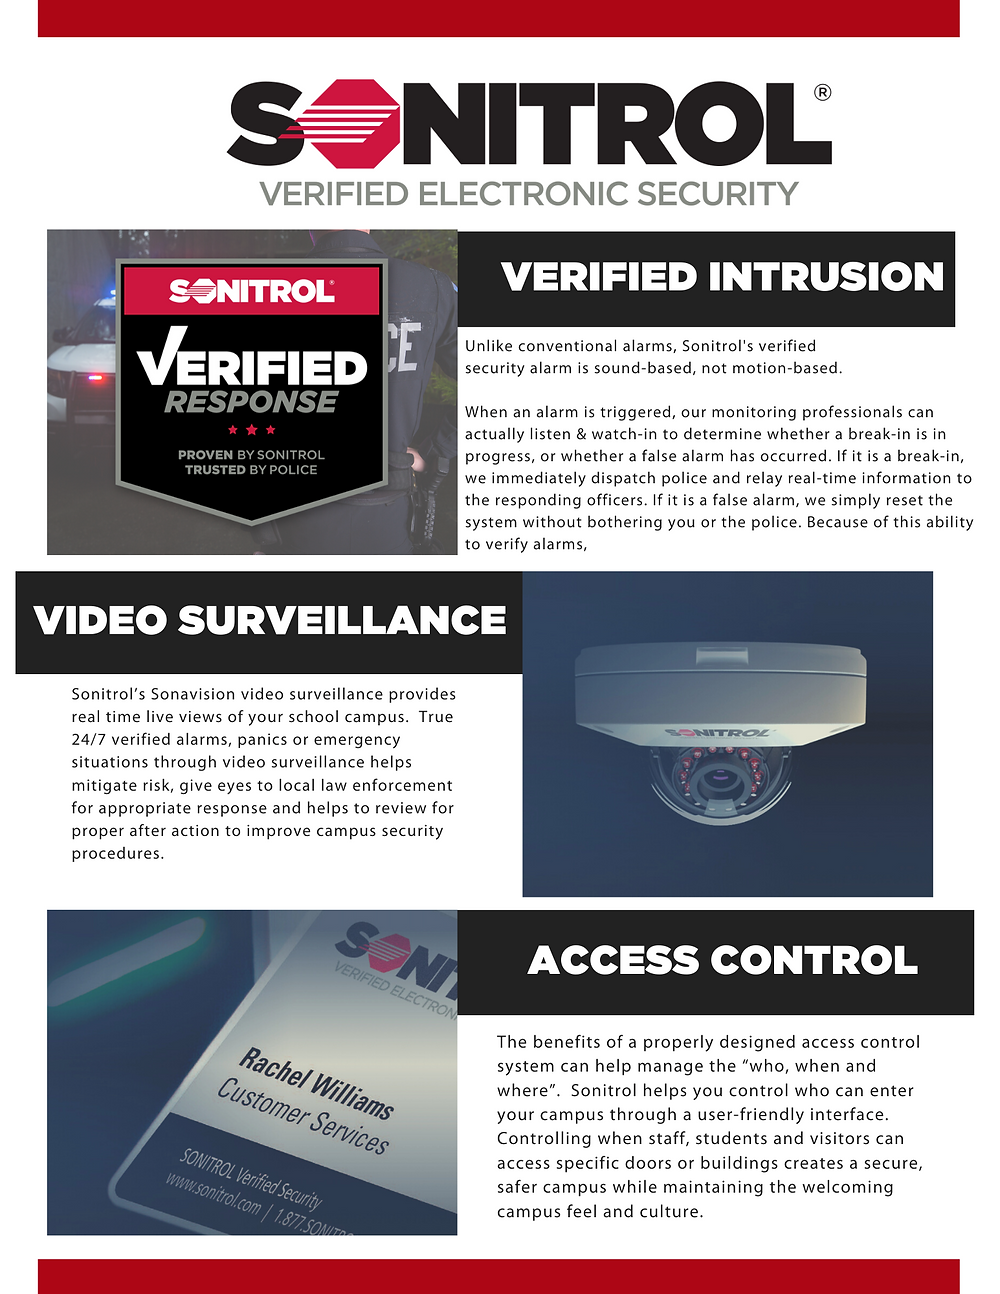 Sonitrol Verified Intrusion Alarm, Sonitrol Verified Video Surveillance, Sonitrol Access Control.